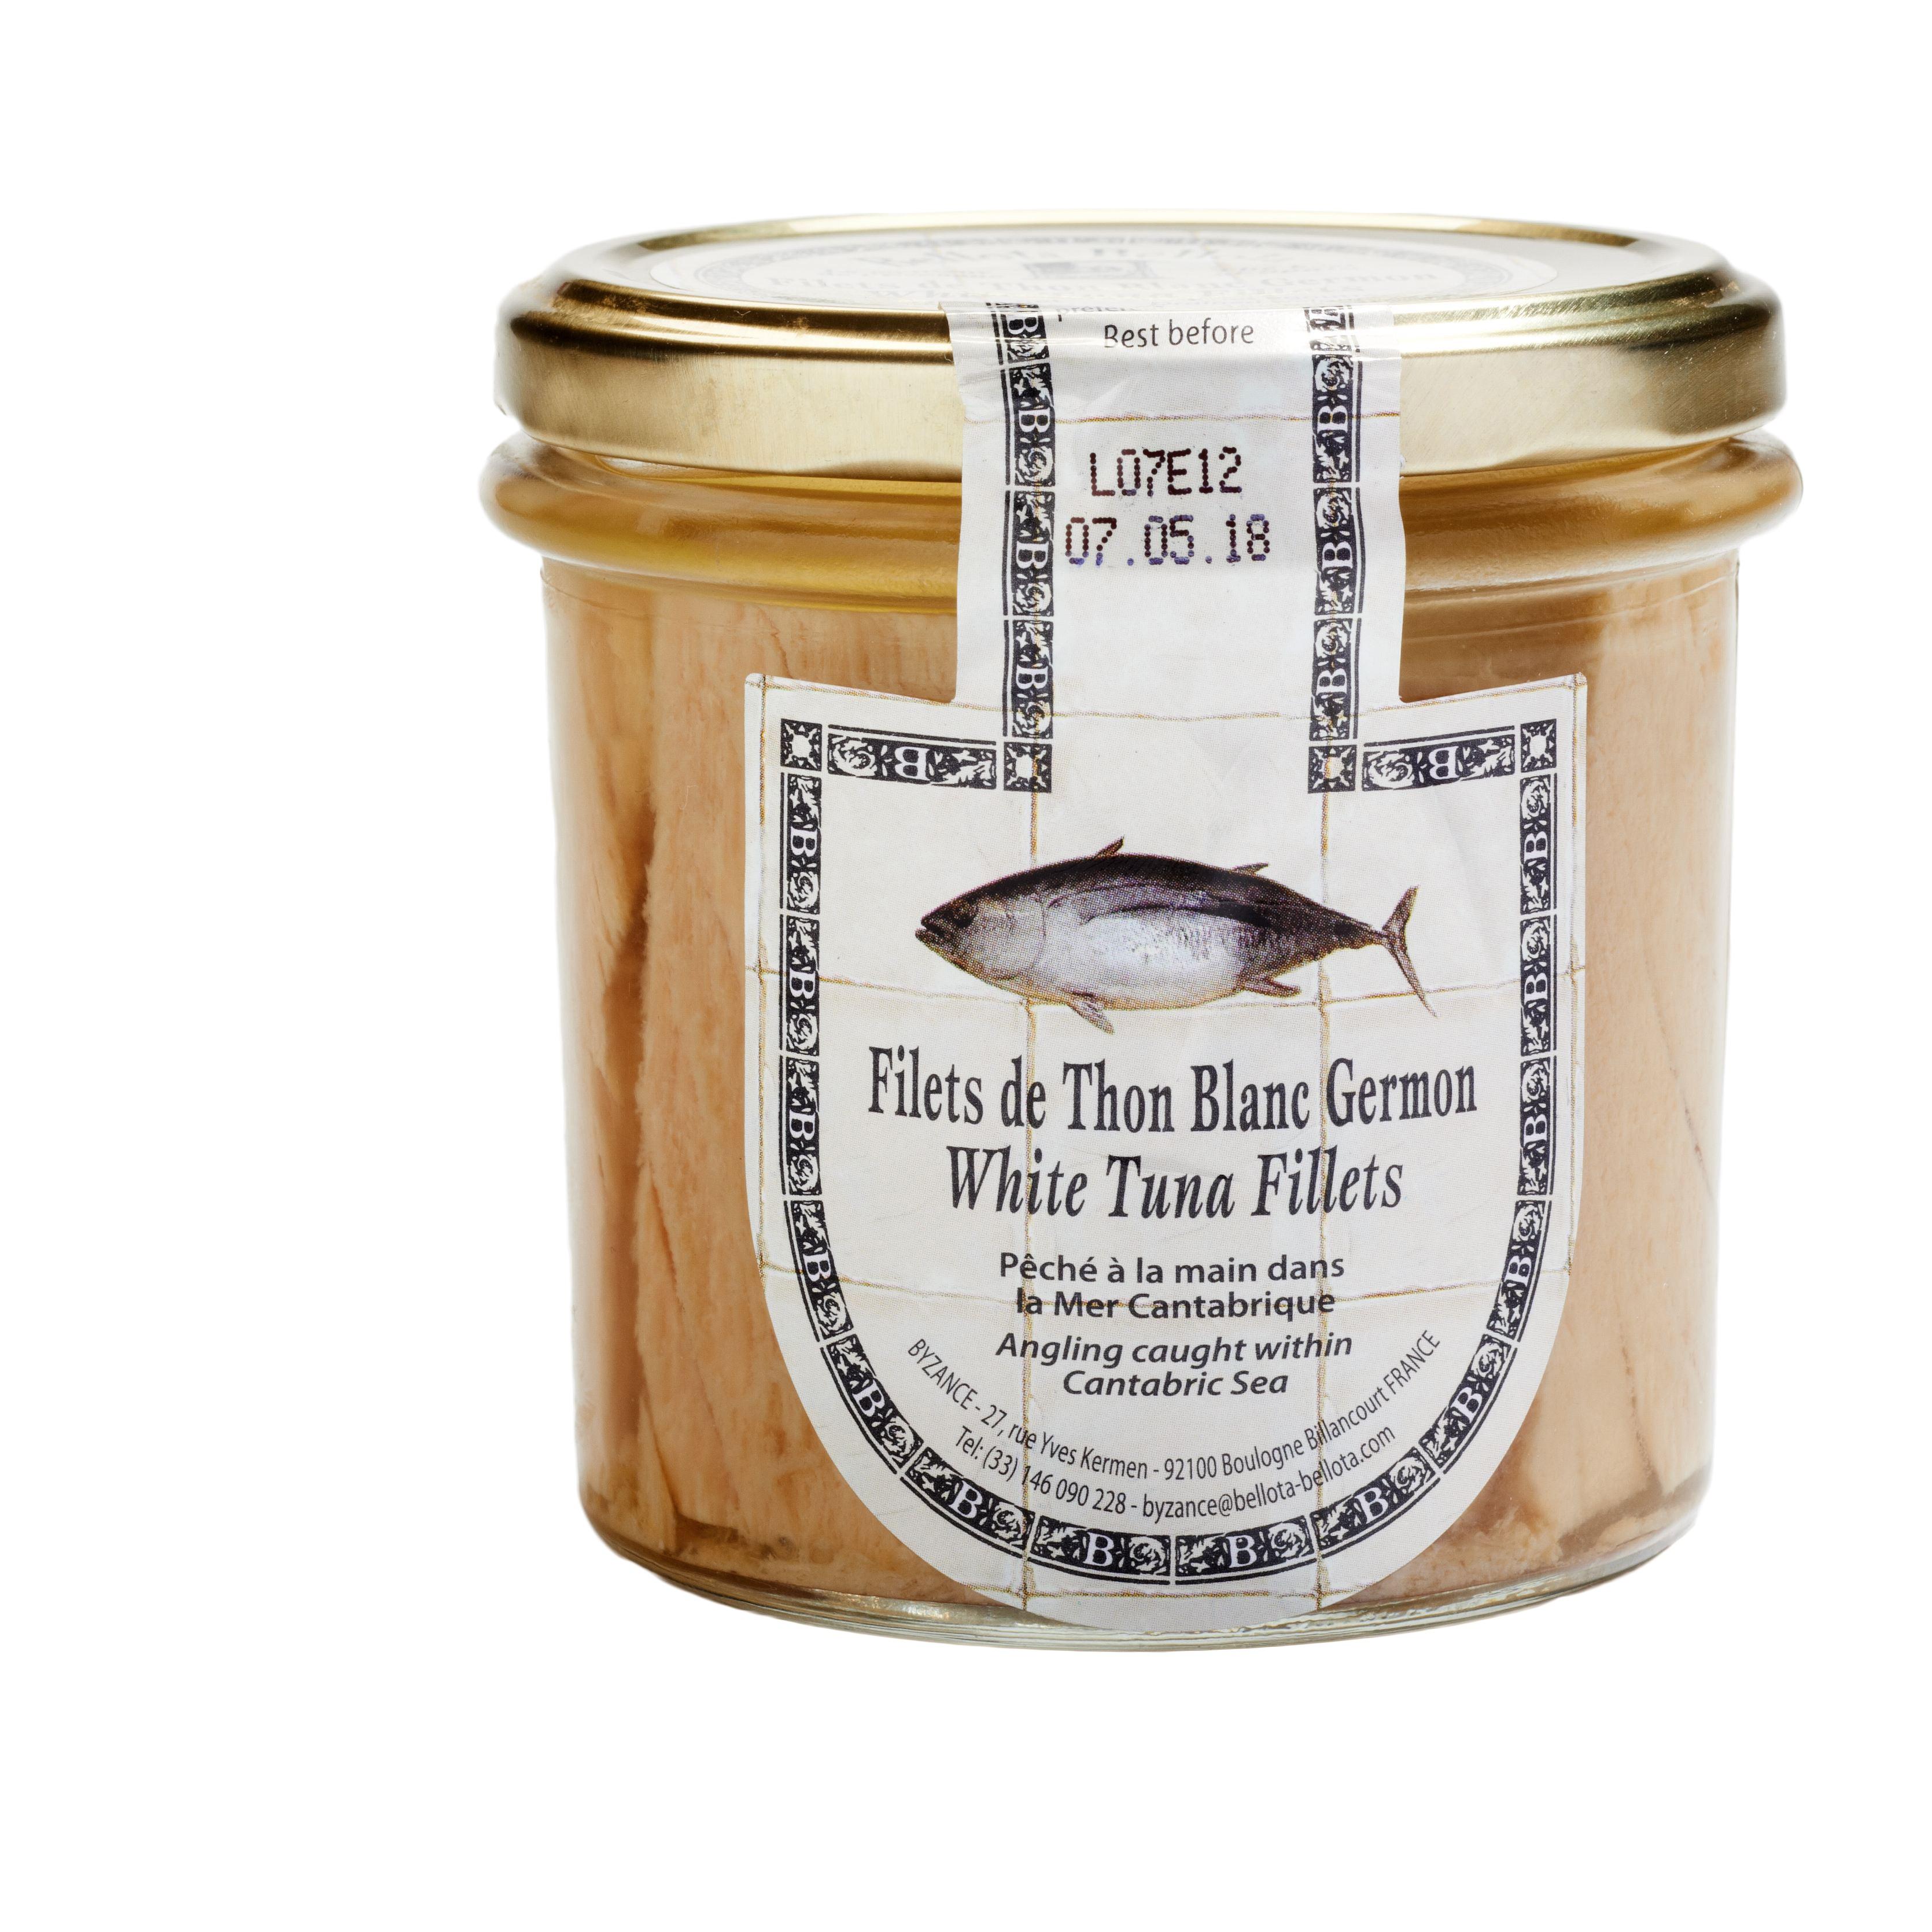 Filets de thon blanc Germon à l'huile d'olive, Bellota-Bellota (225 g)